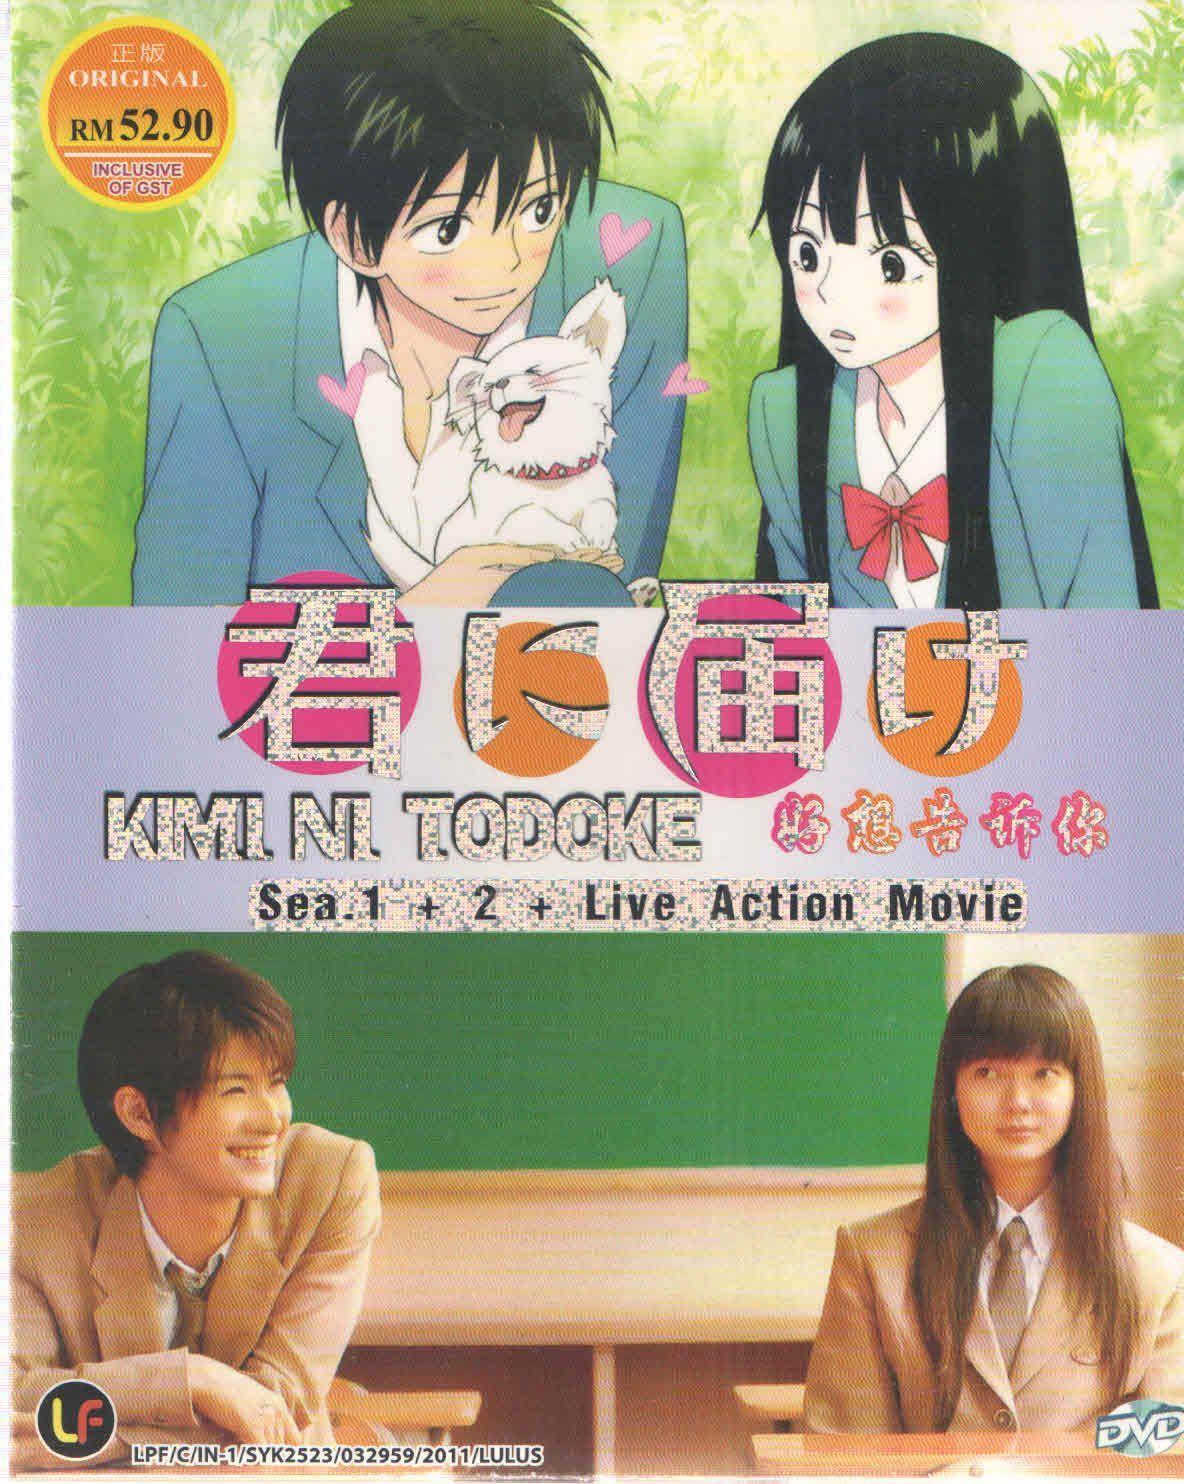 Dvd Kimi Ni Todoke Season 1 + 2 + Live Movie Dvd +Free 1